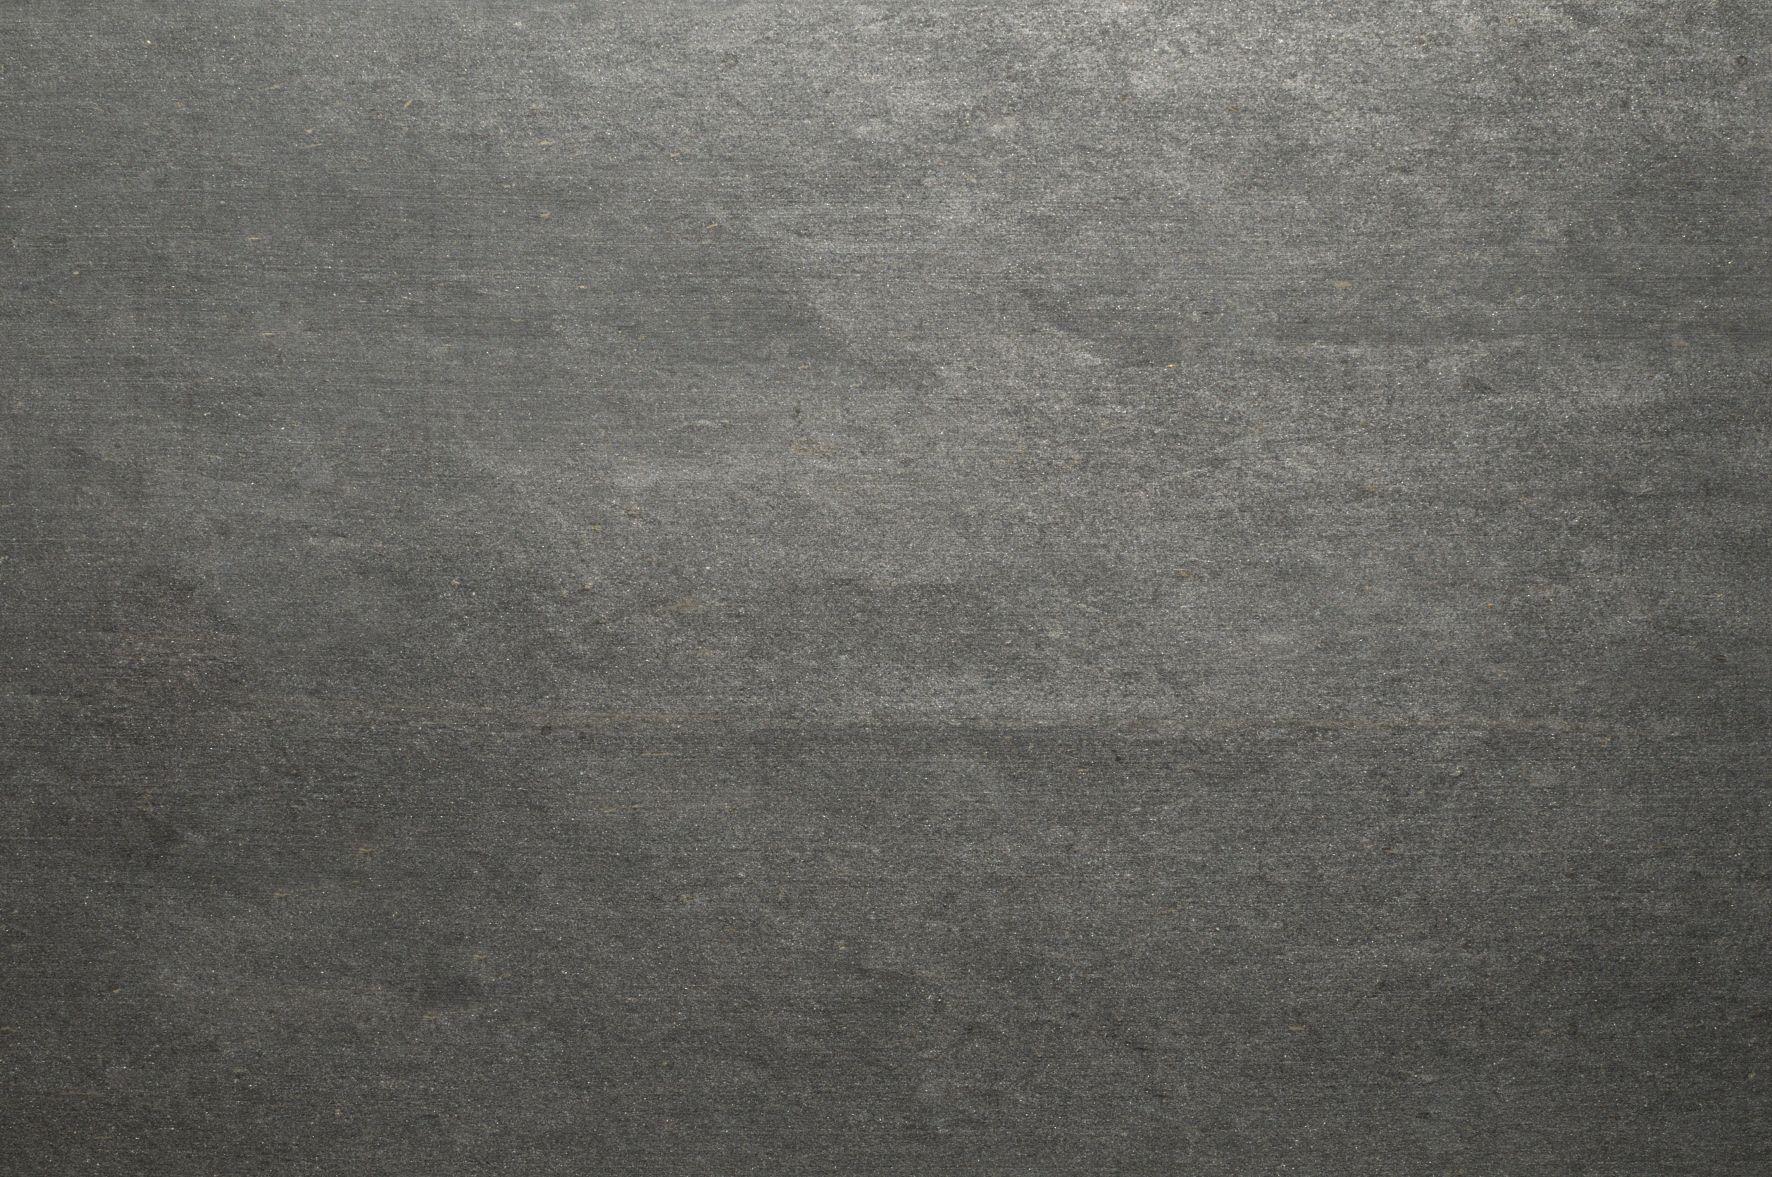 ardoise textures pinterest ardoise. Black Bedroom Furniture Sets. Home Design Ideas